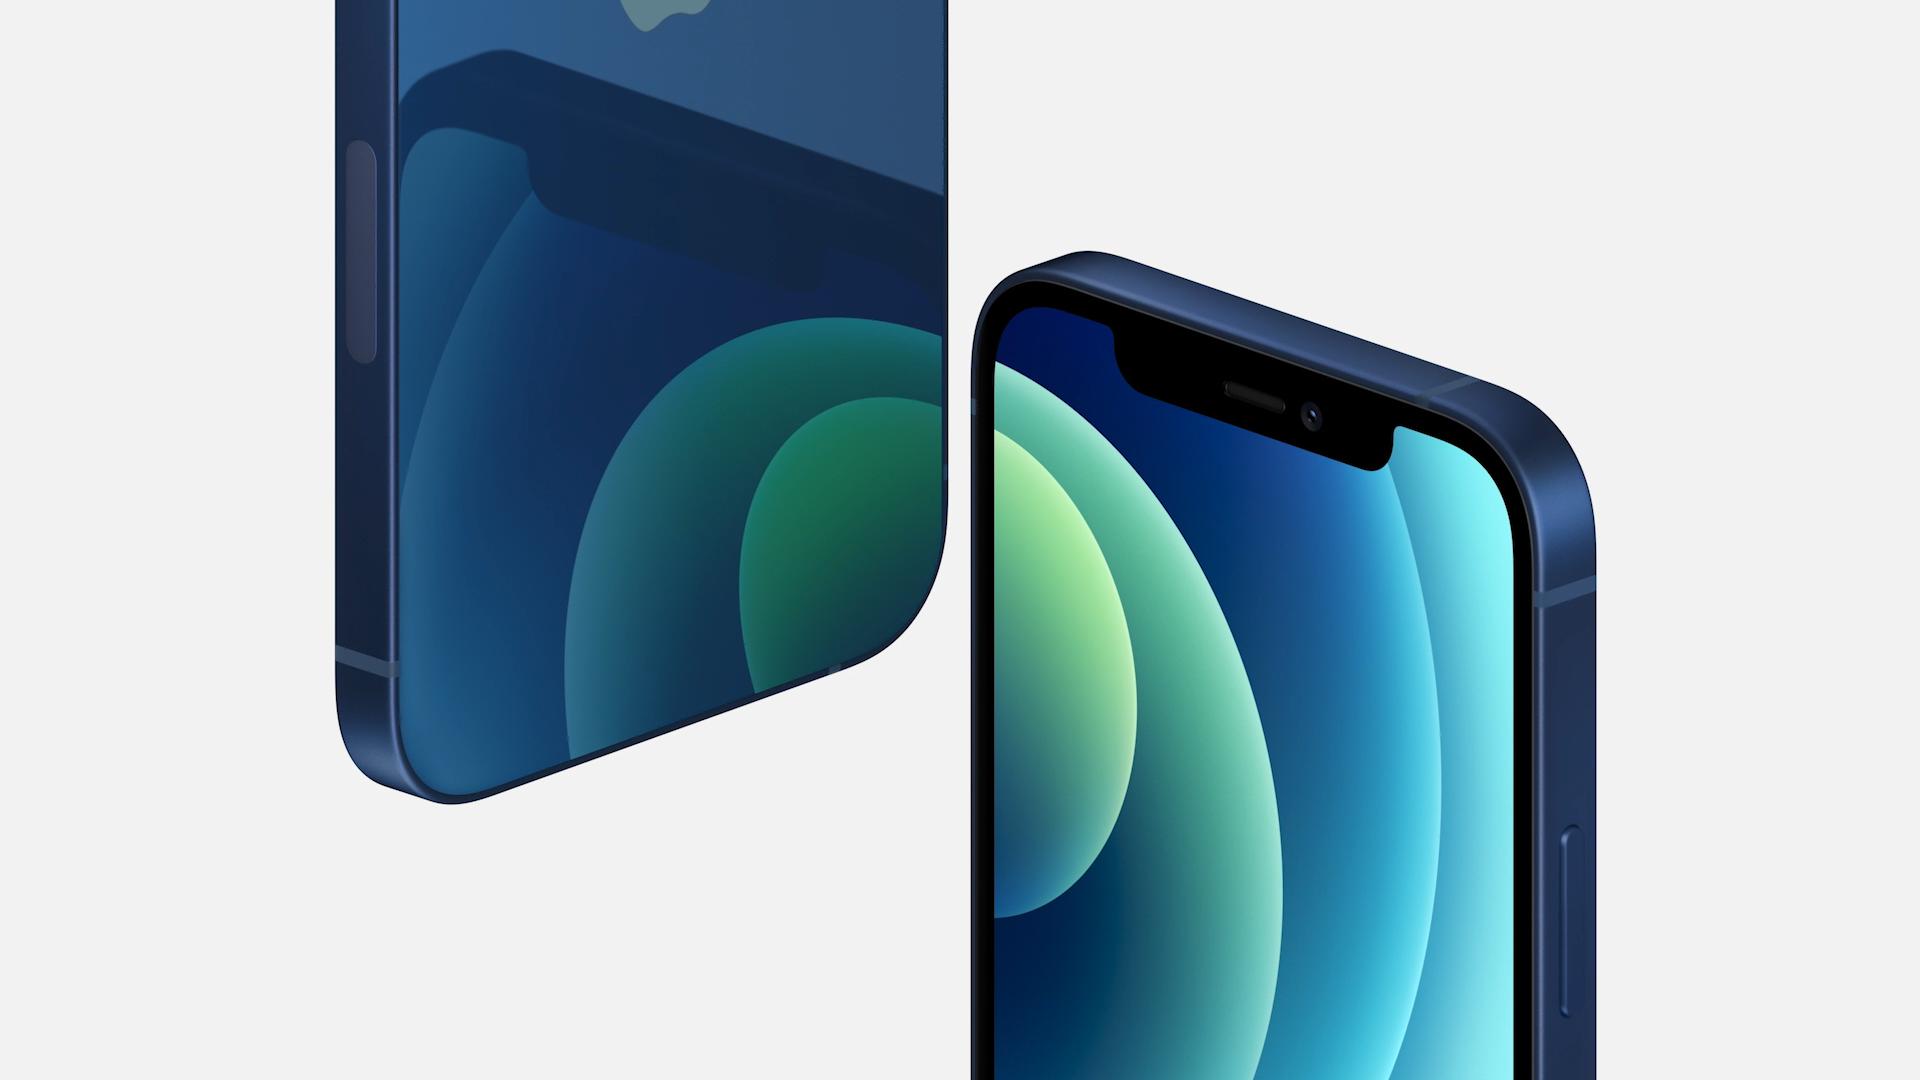 Tα νέα iPhone 12! – Έρχονται με OLED οθόνη και 5G - Φωτογραφία 2